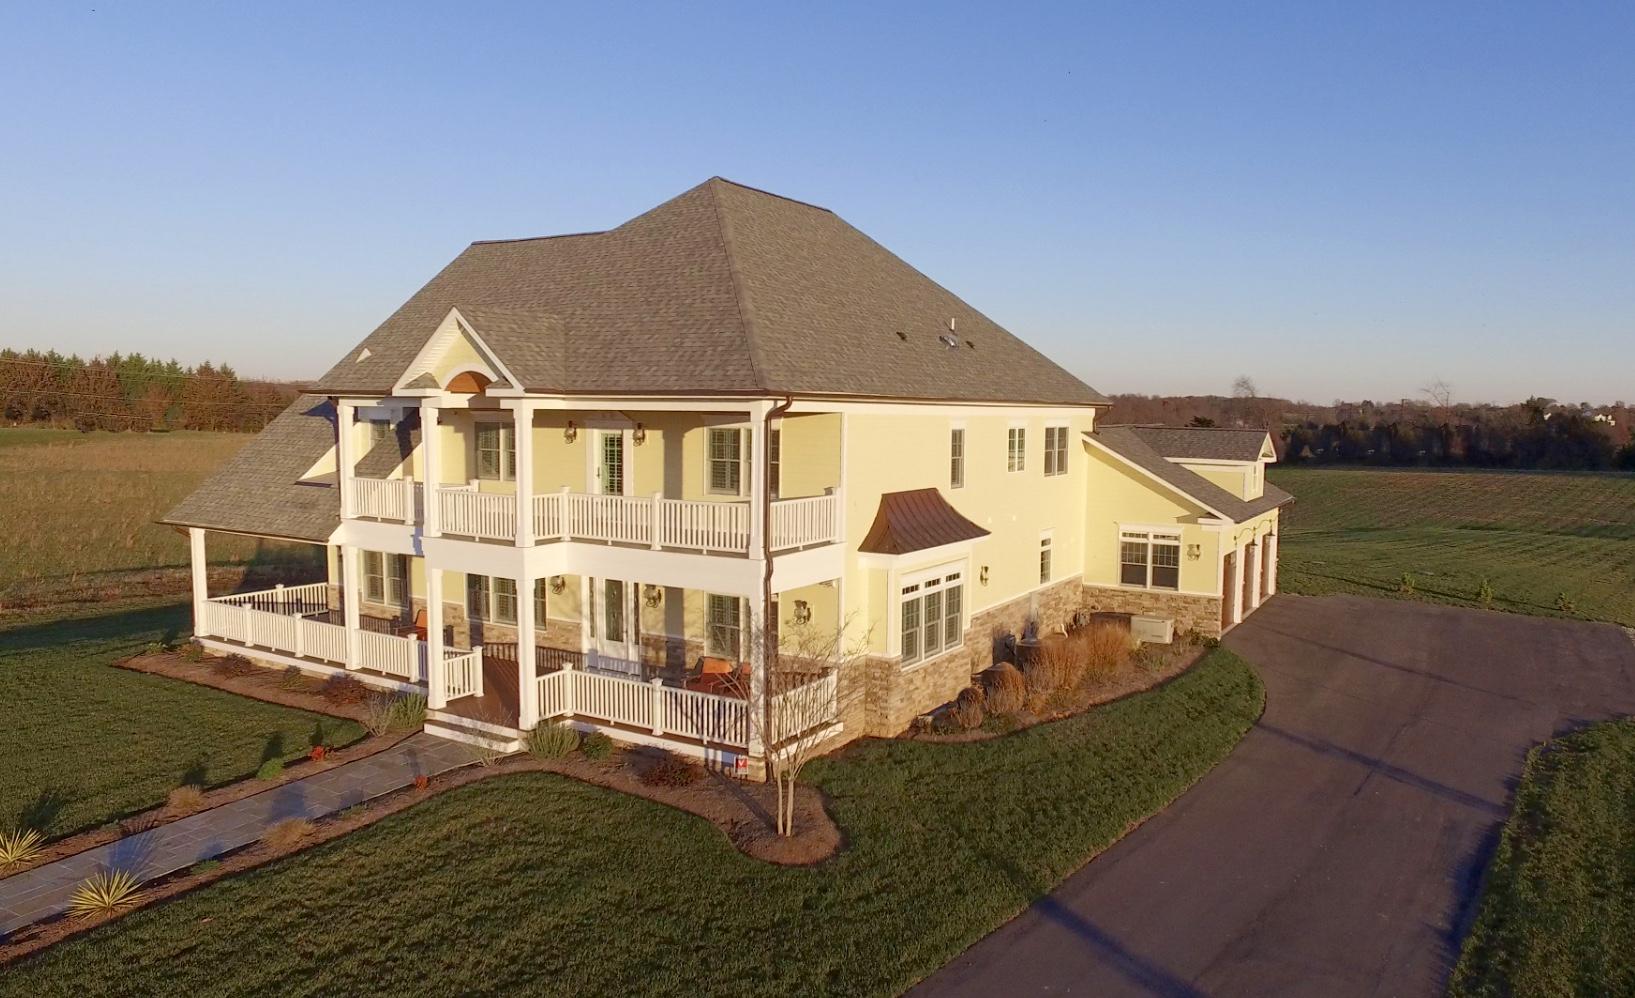 Brami Manor